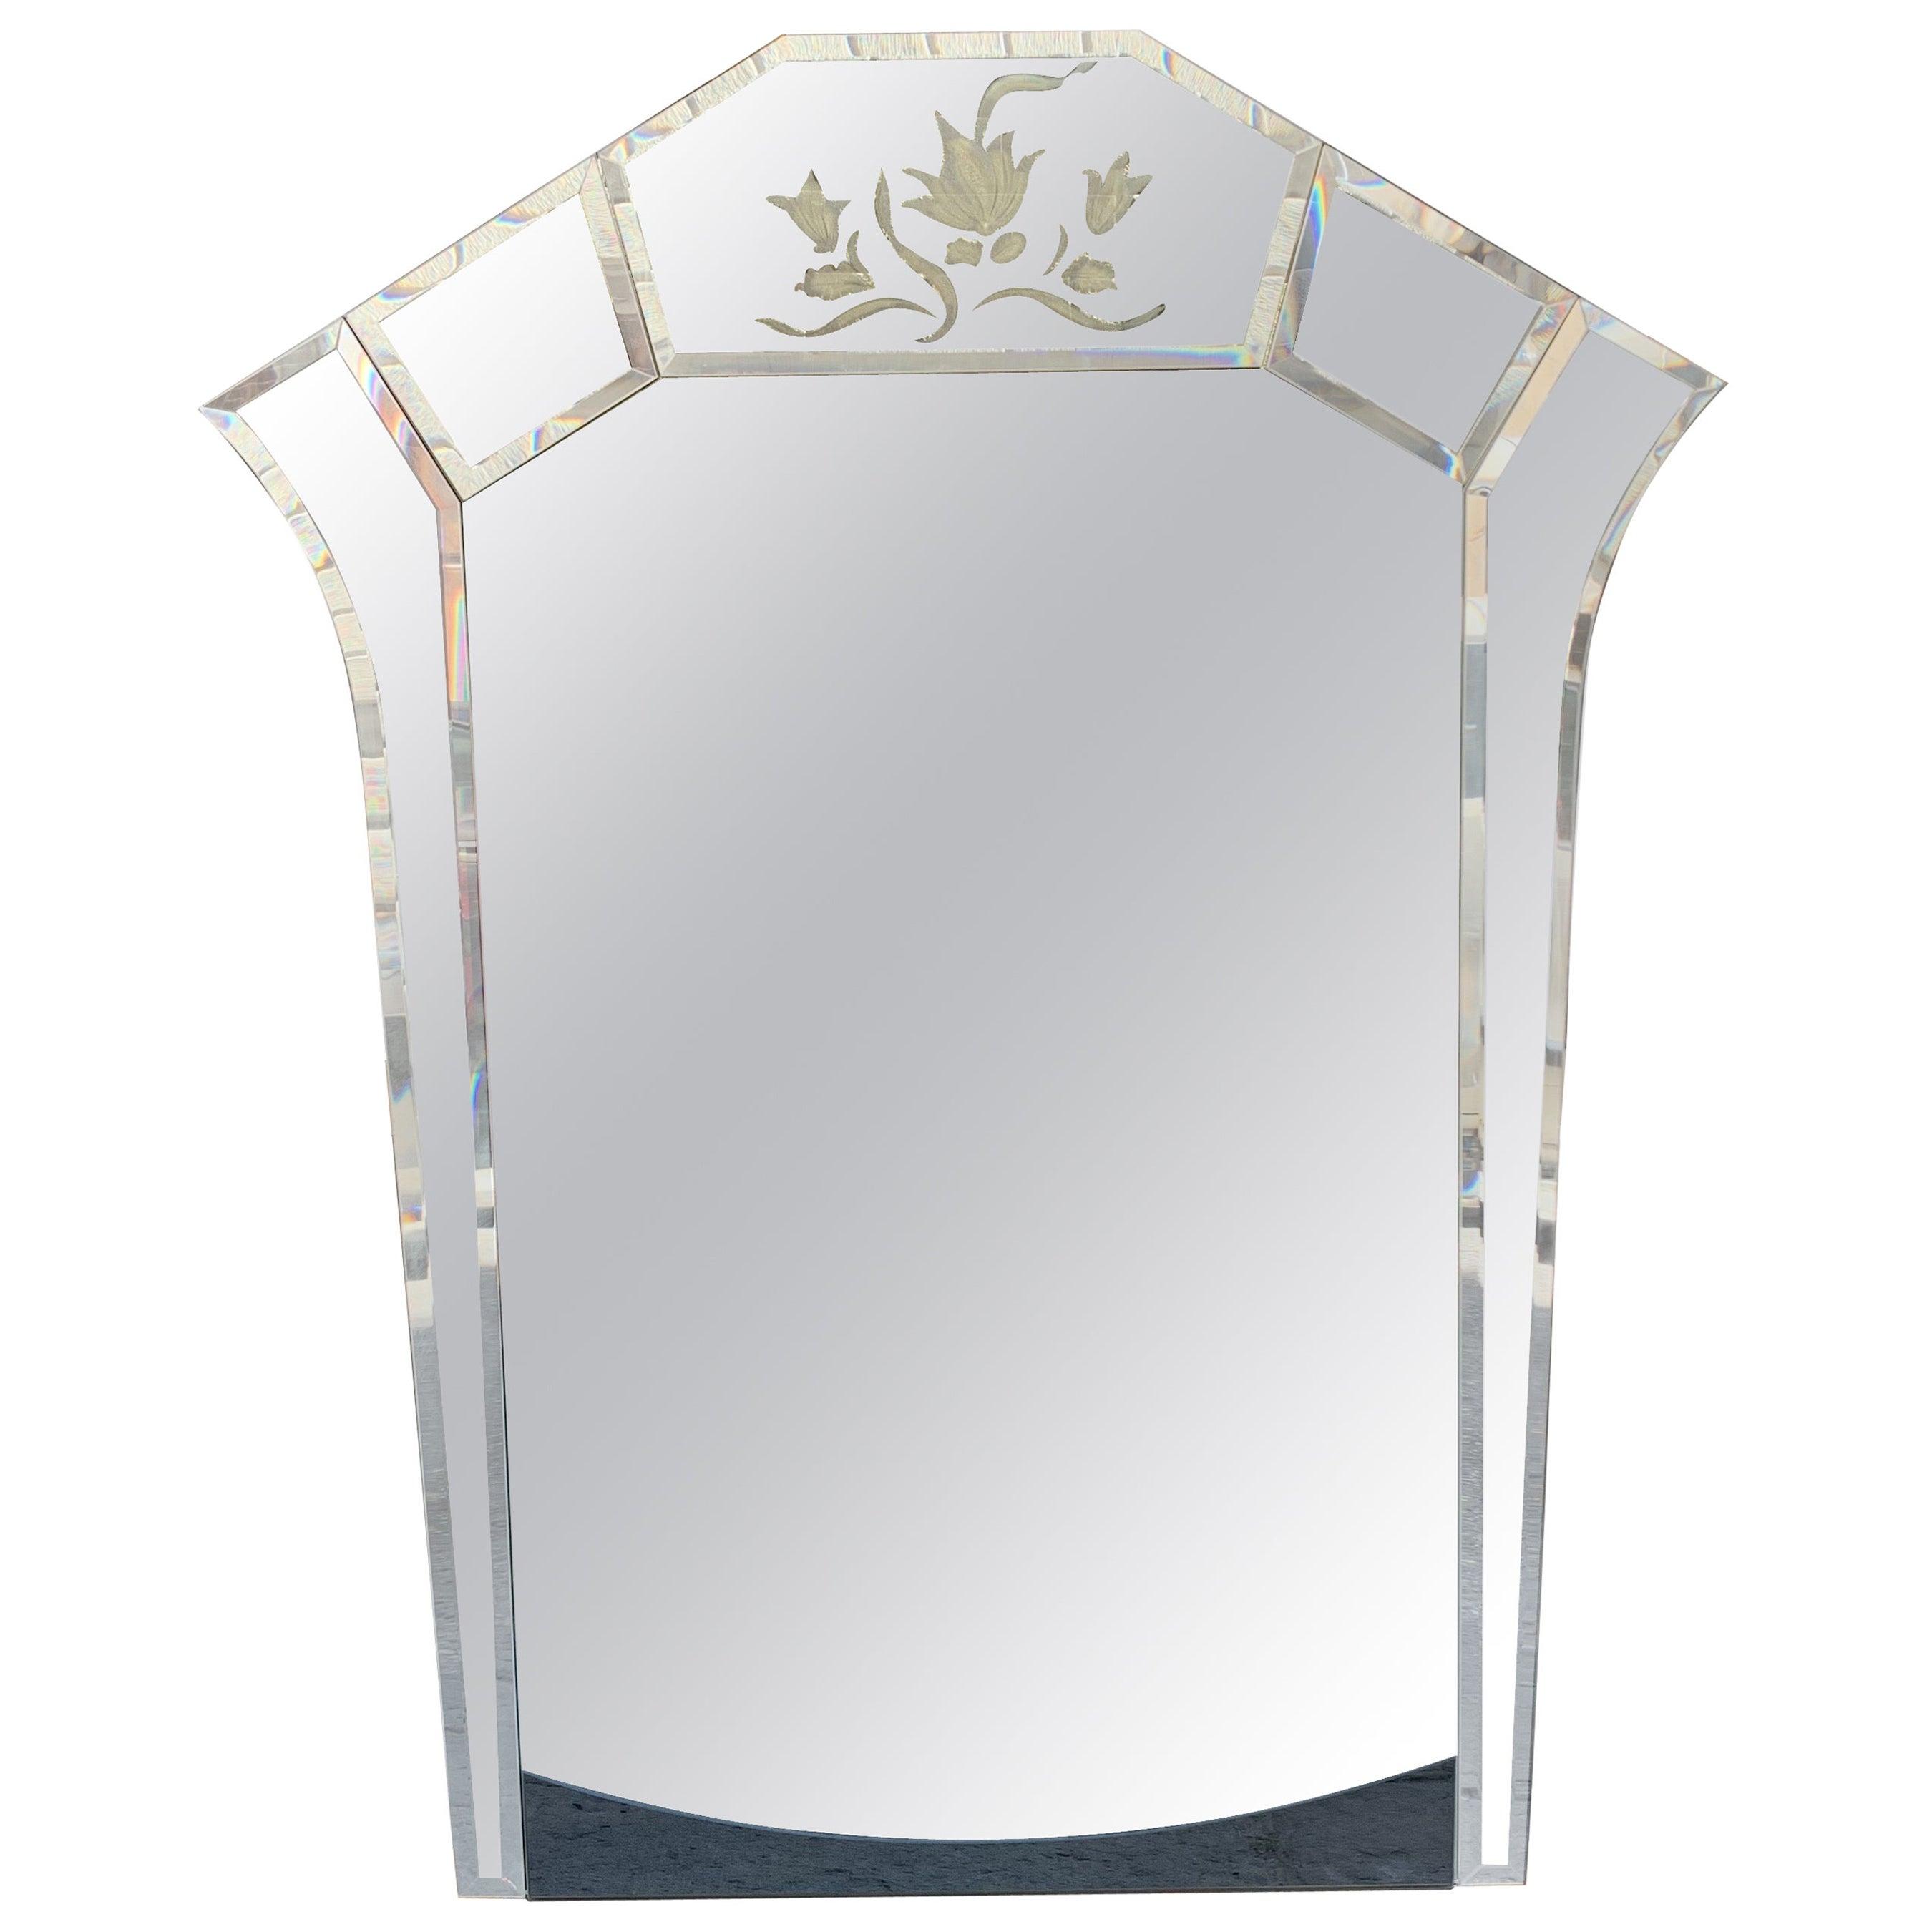 Art Deco Mercury Ground Glass Mirror with Engravings, 1940s